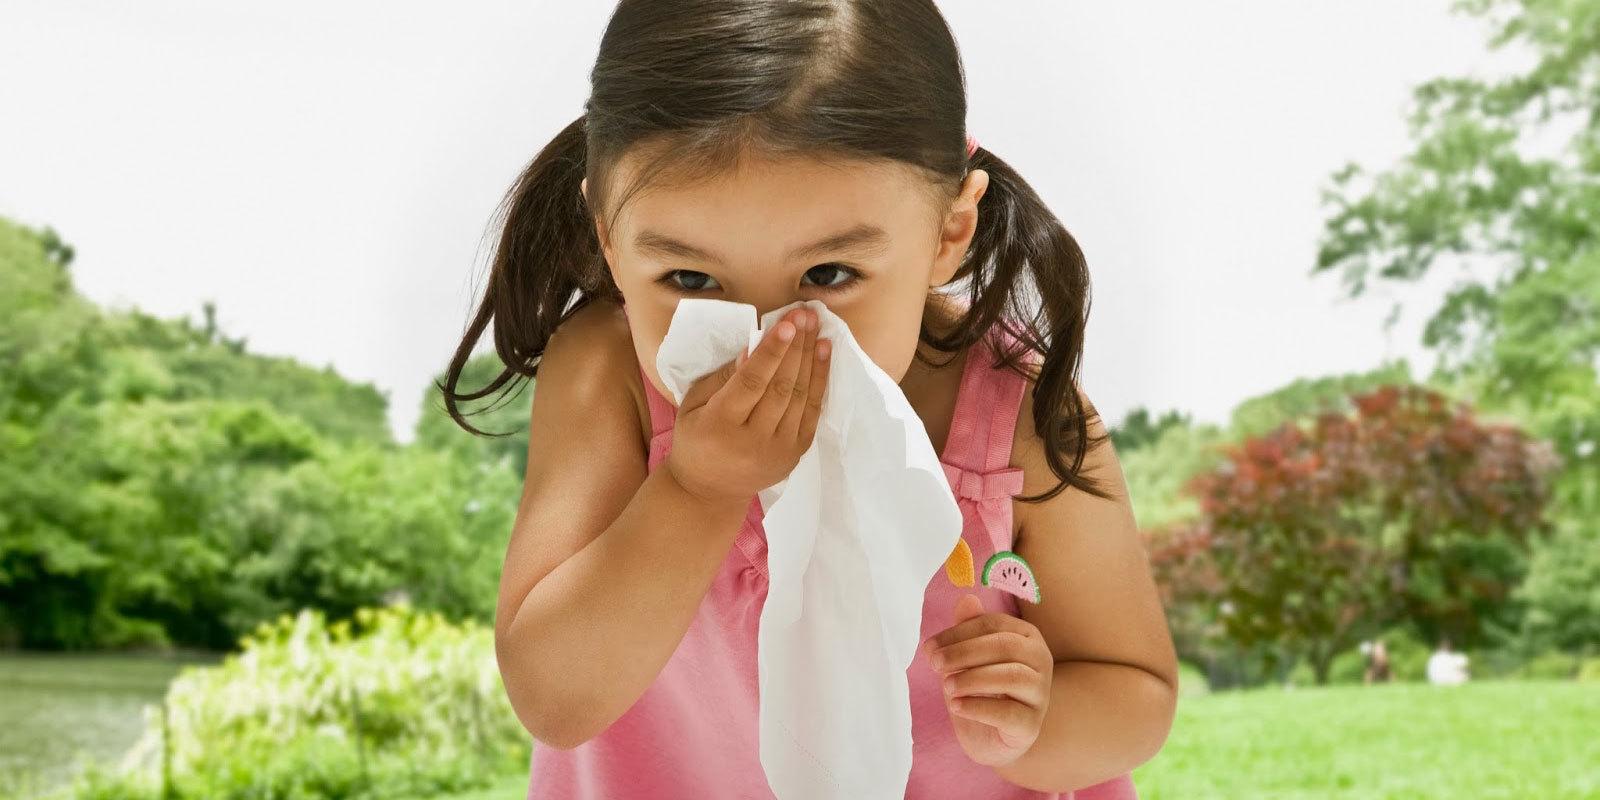 child-sneezing.jpg